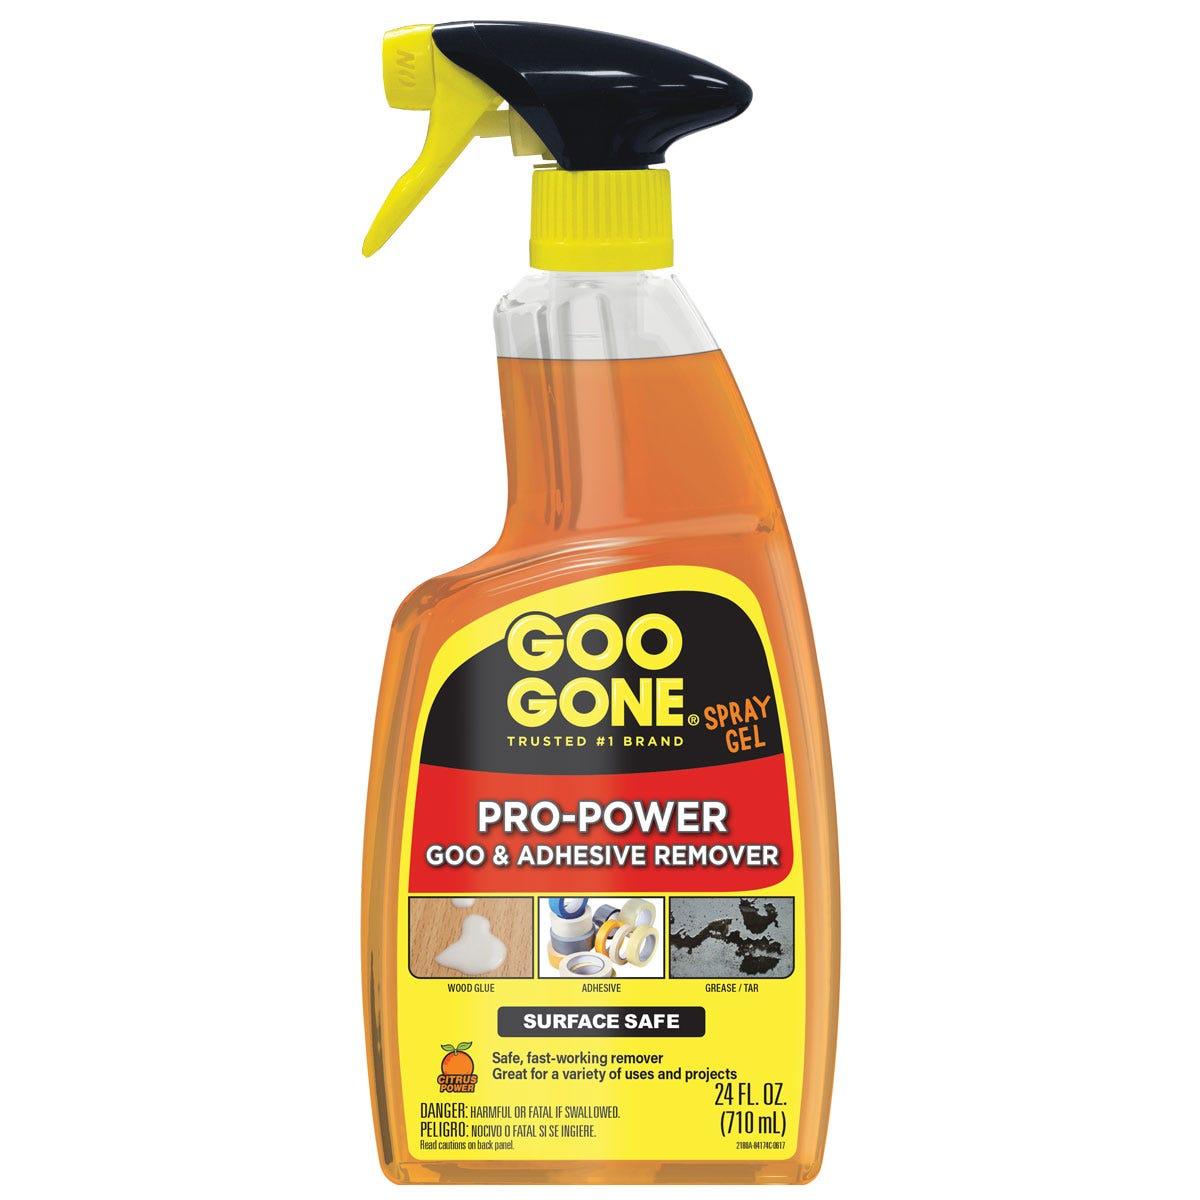 Goo Gone Pro Power Spray Gel Goo Gone